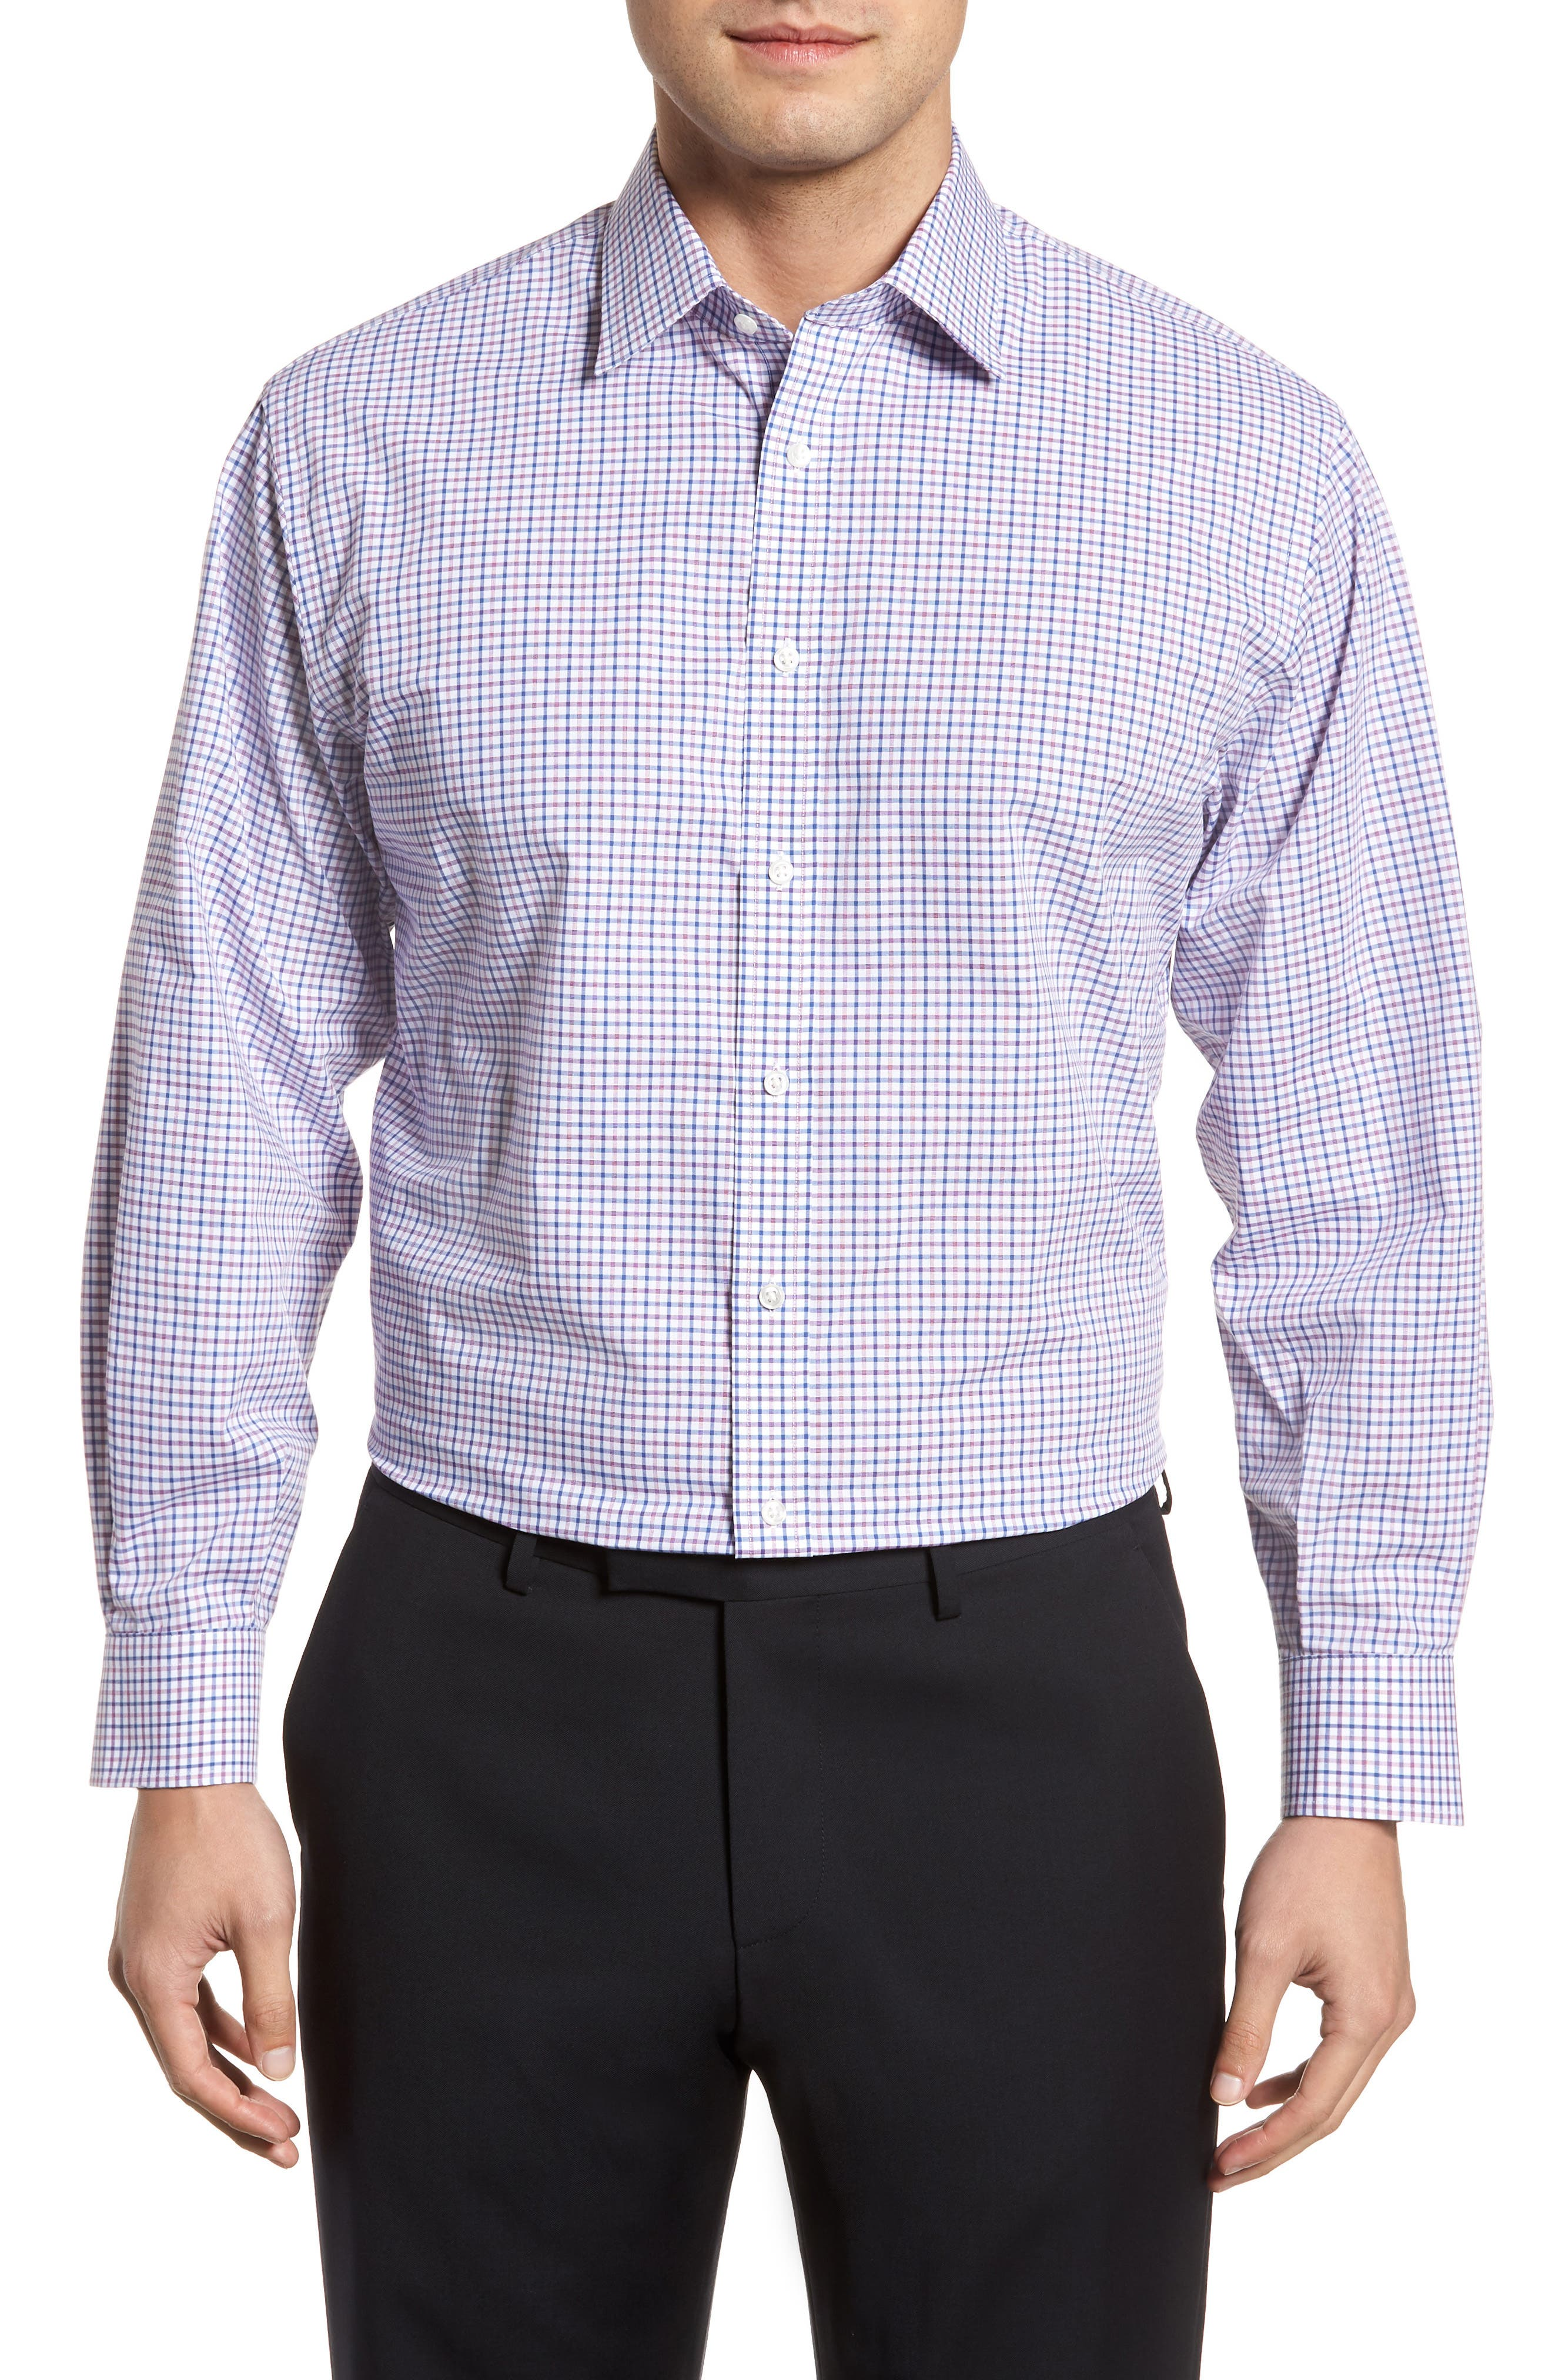 Main Image - Nordstrom Men's Shop Classic Fit Check Dress Shirt